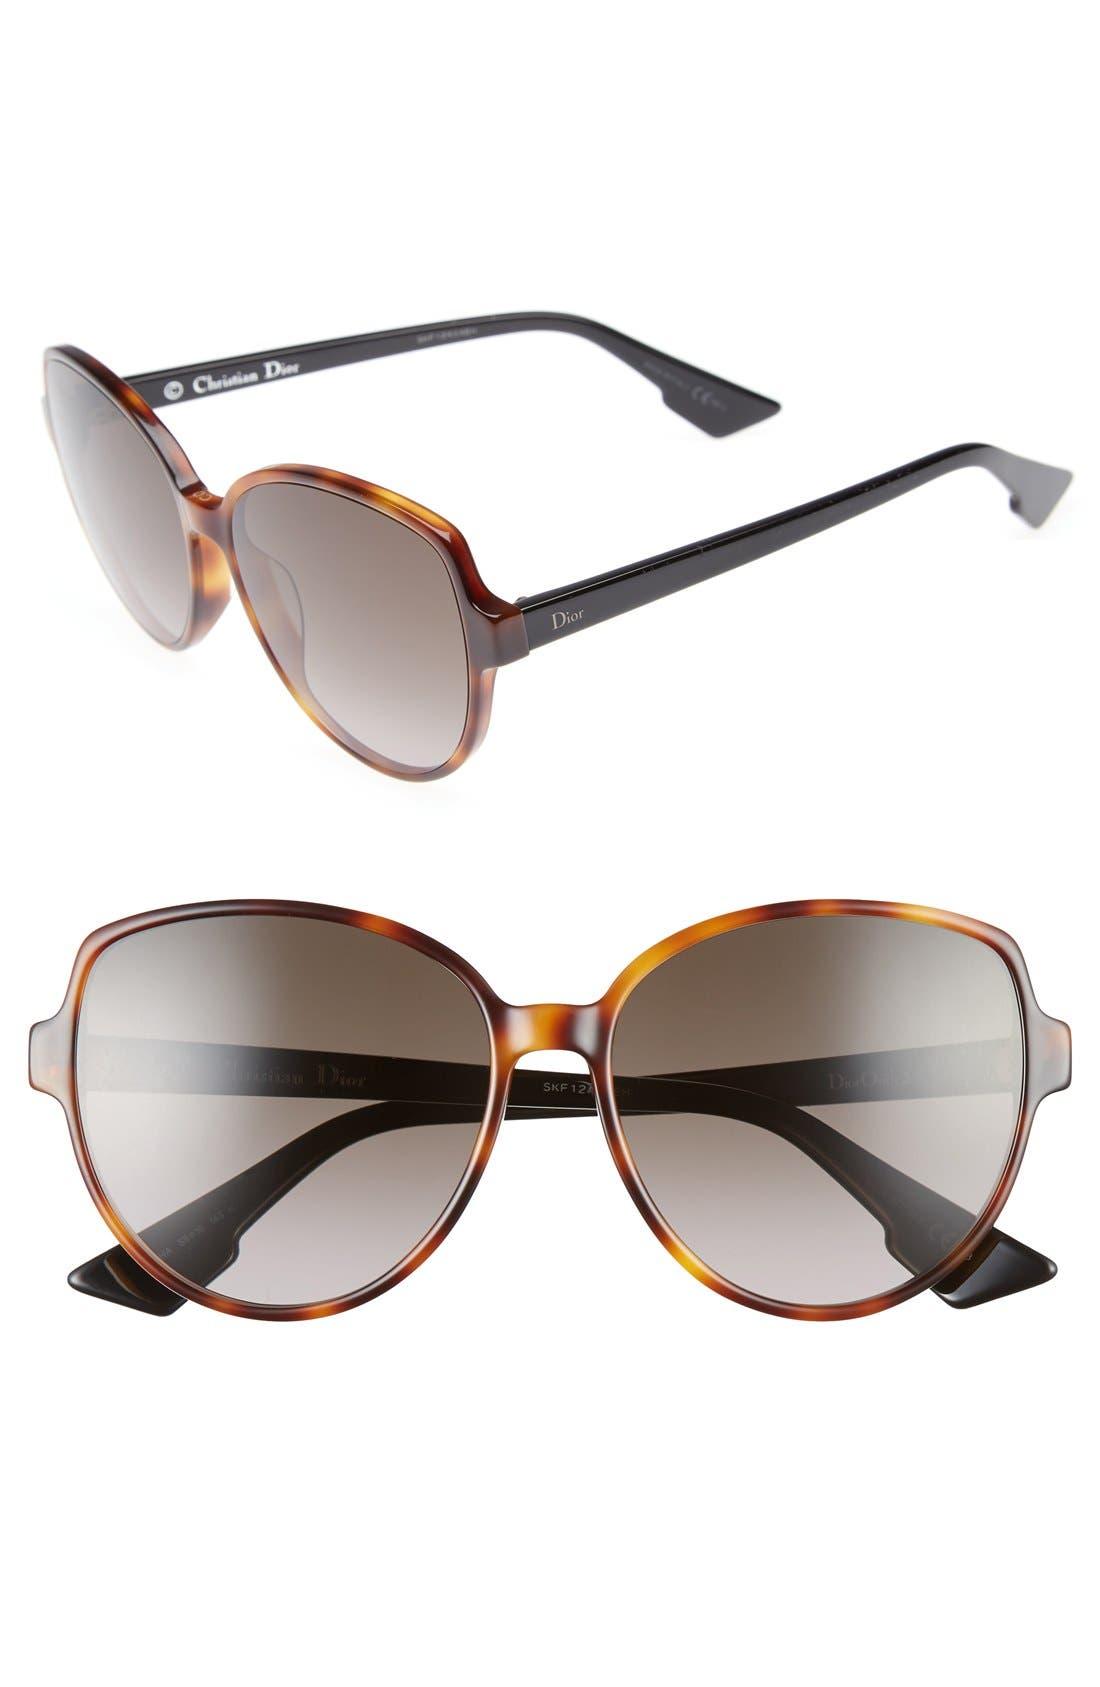 Main Image - Dior Onde 2 58mm Sunglasses